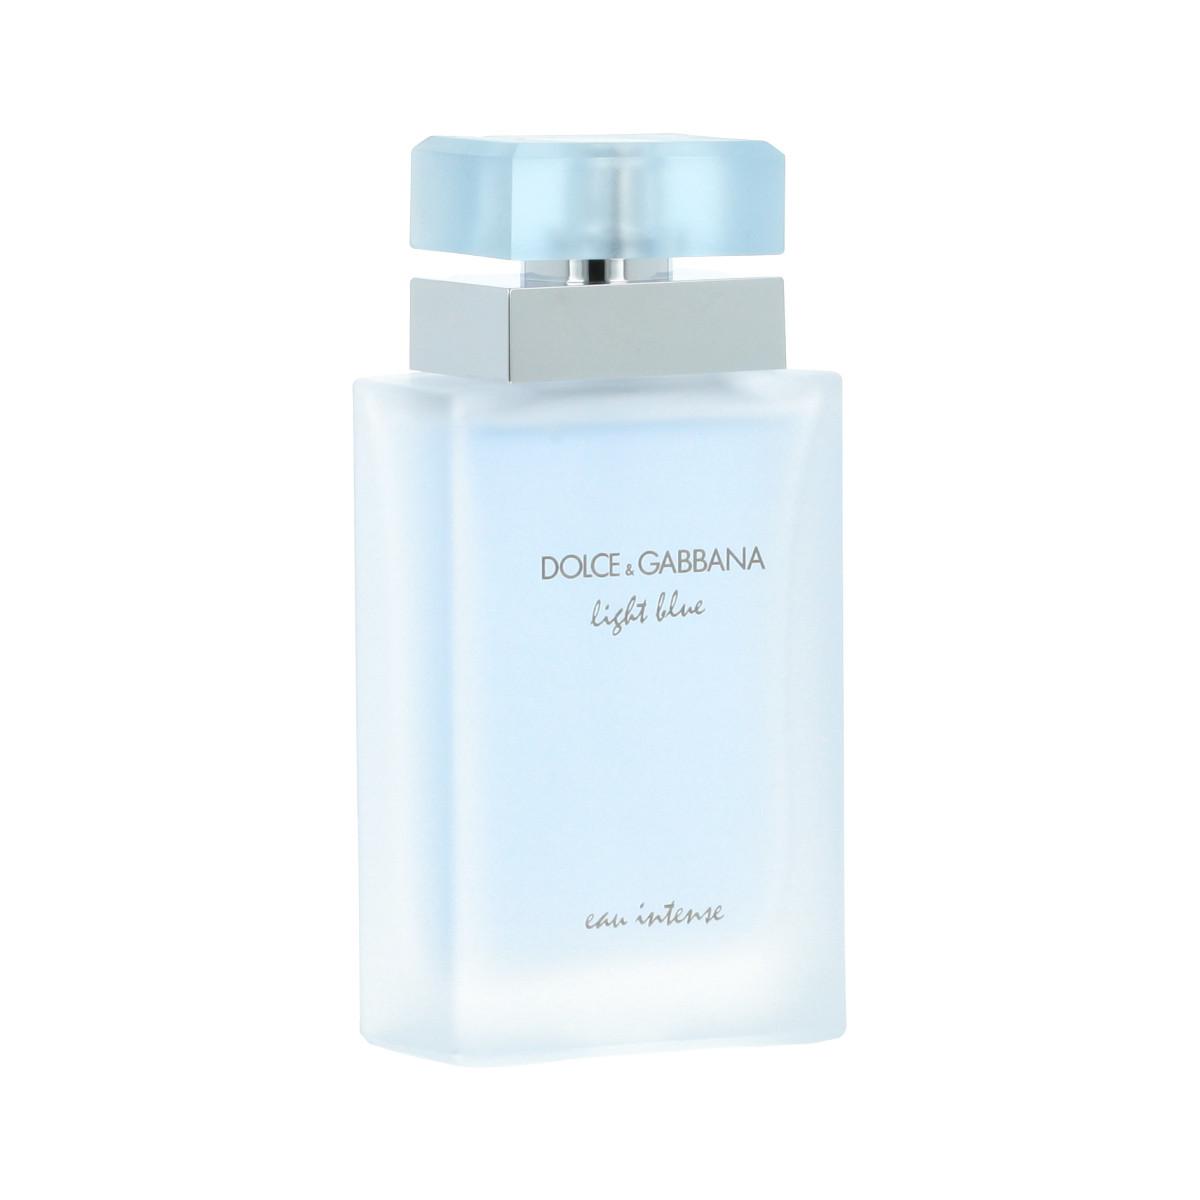 dolce gabbana light blue eau intense eau de parfum 50 ml woman light blue eau intense. Black Bedroom Furniture Sets. Home Design Ideas